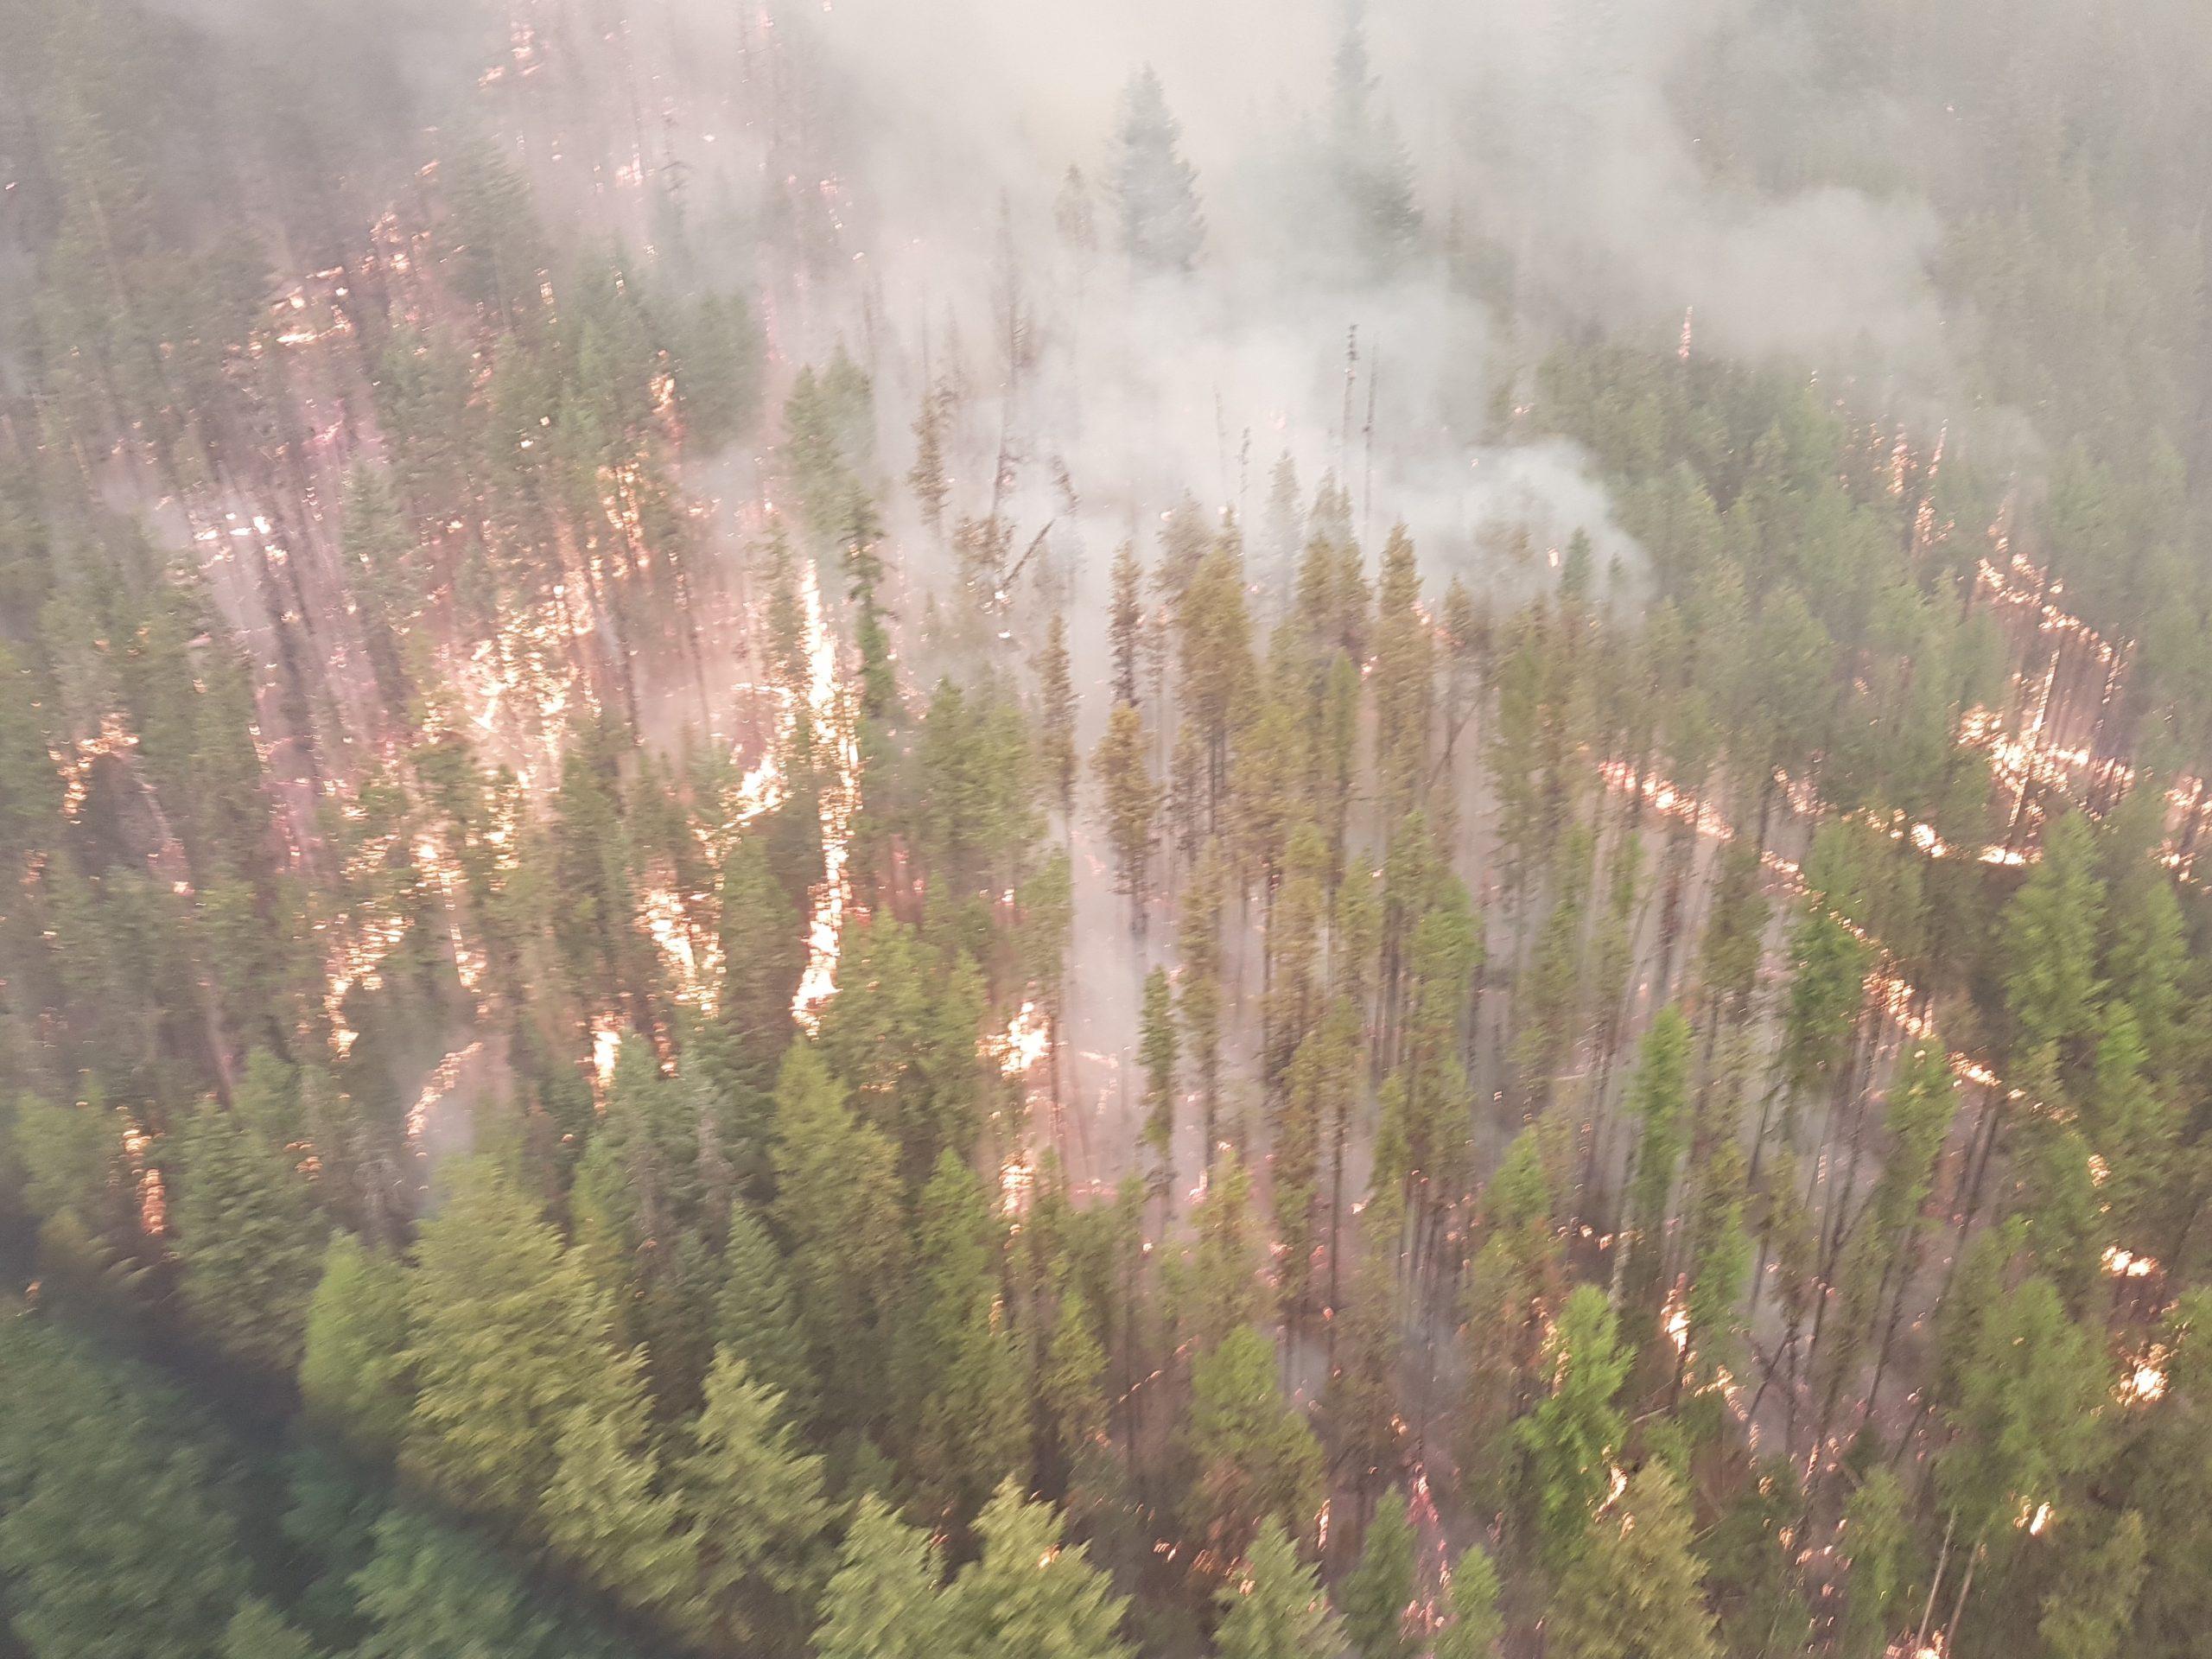 Decreased smoke a catch 22 for firefighters: Meachen Creek fire information officer